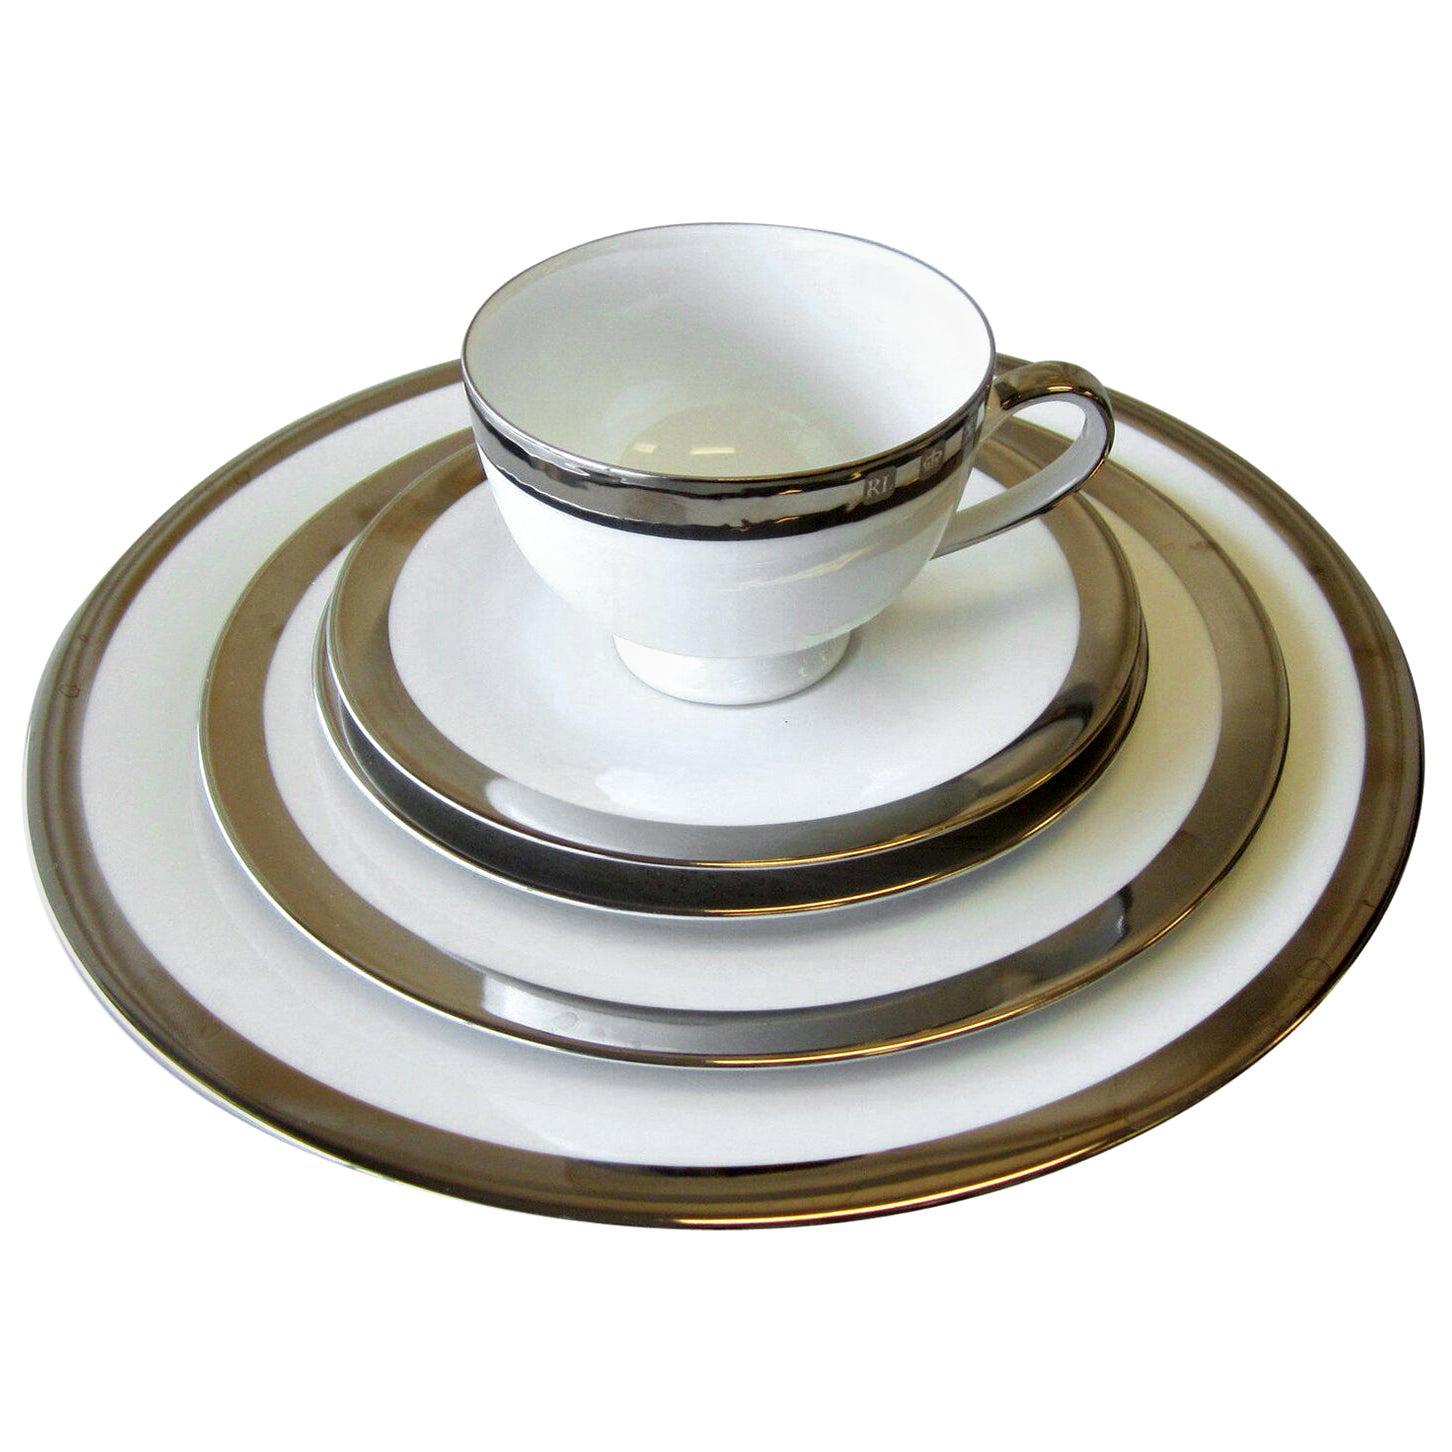 Ralph Lauren Academy Platinum Dinnerware, Set of 4 Place Settings